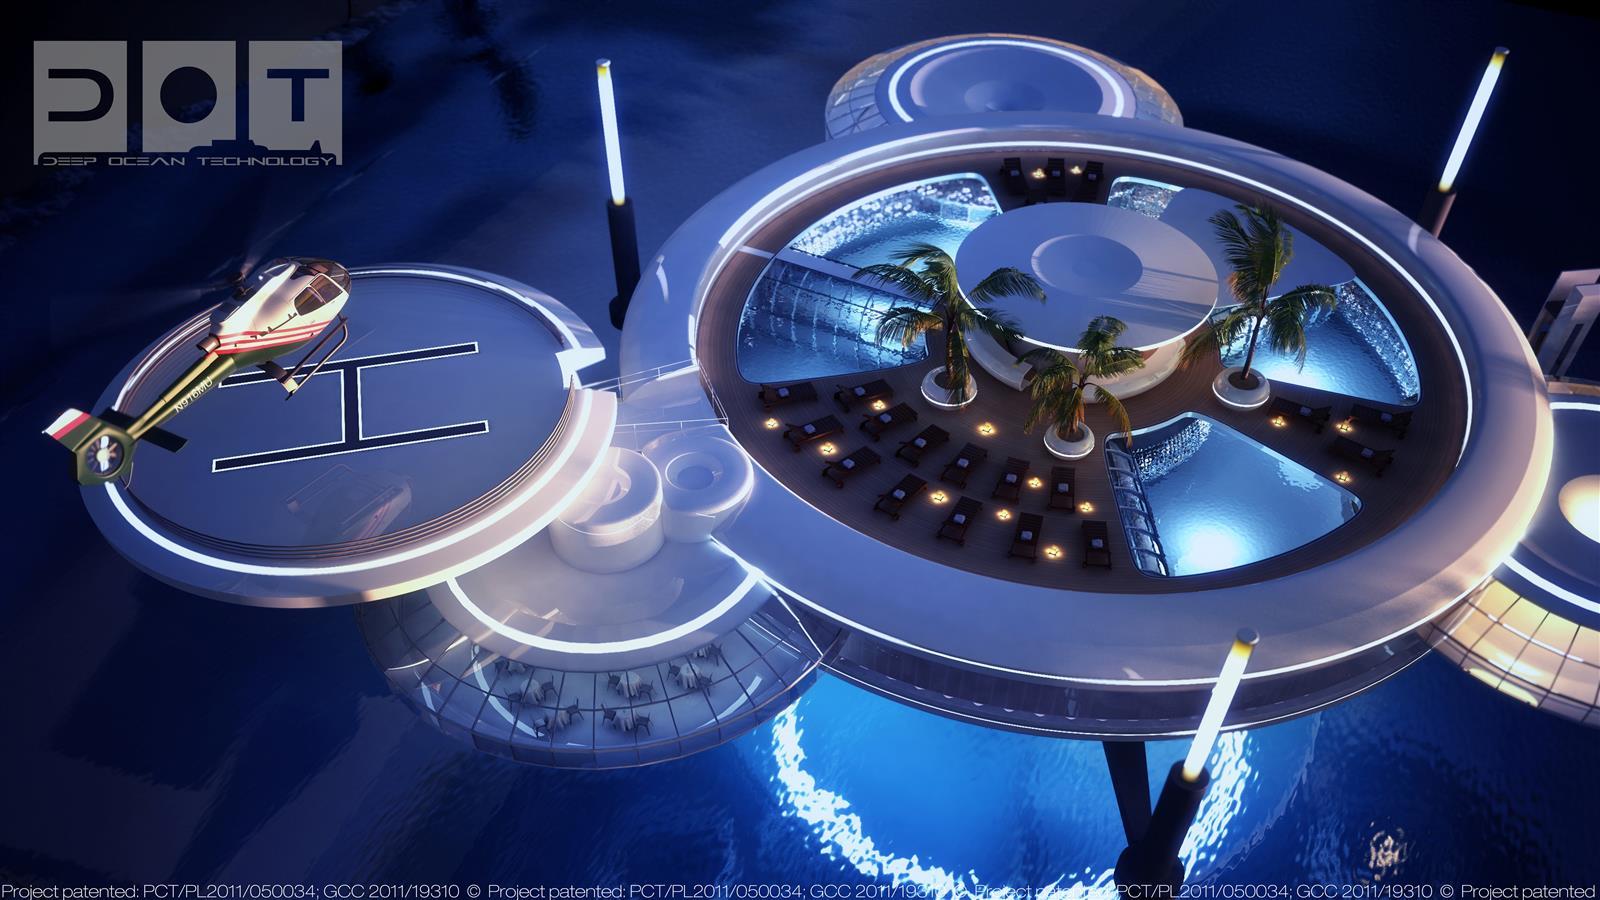 Water Discus Underwater Hotels In Dubai (7)